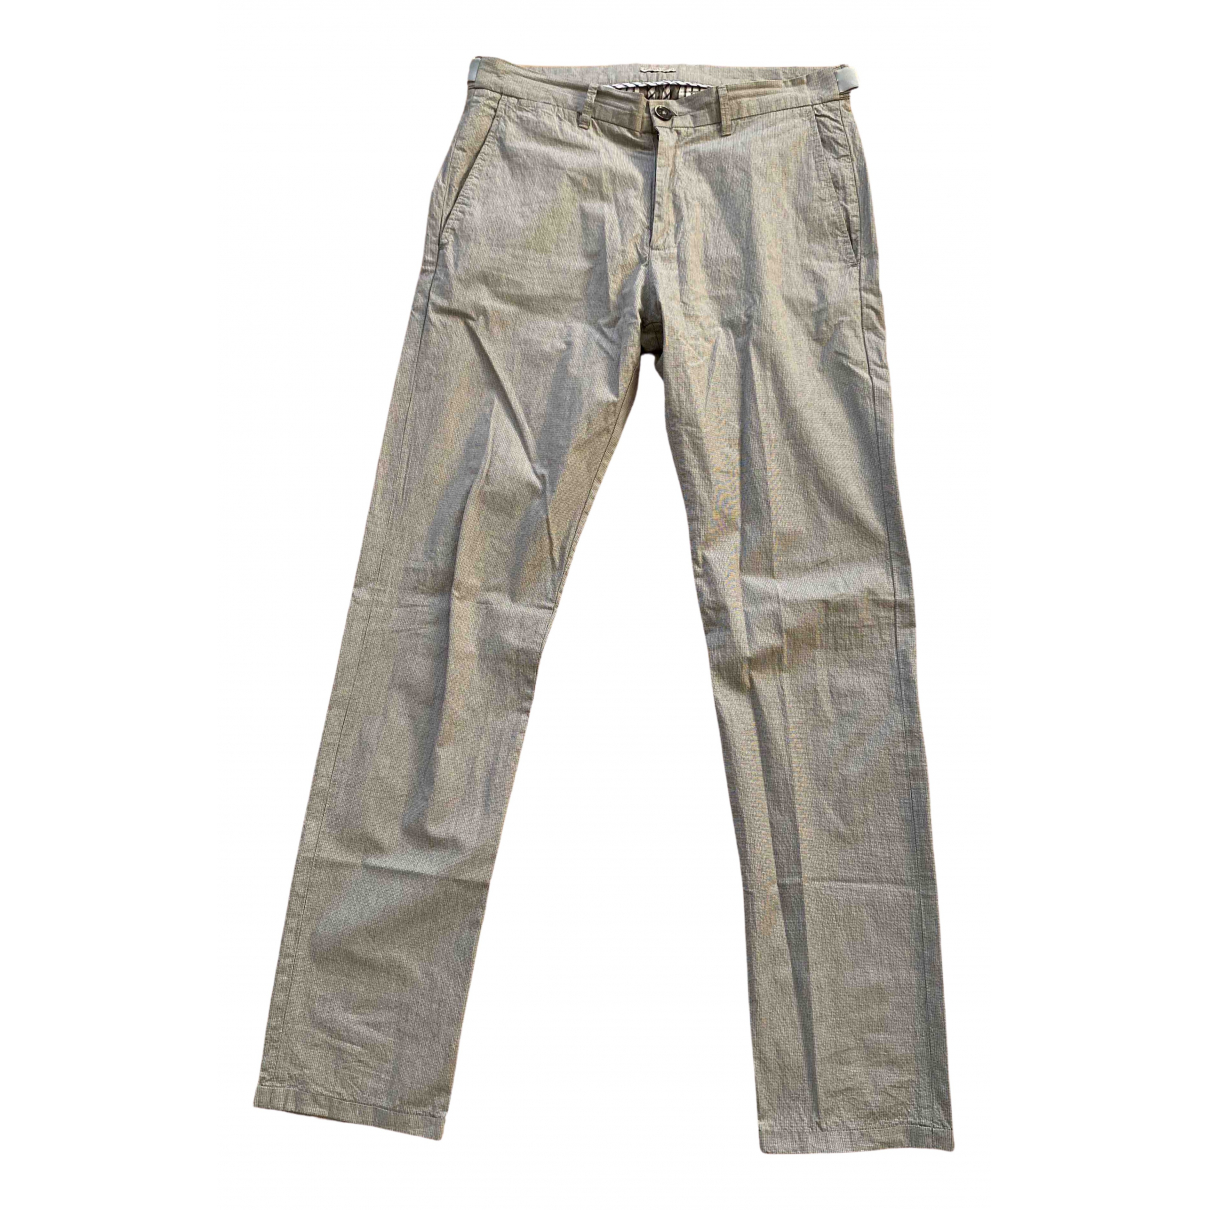 Bottega Veneta \N Beige Cotton Trousers for Men 48 IT